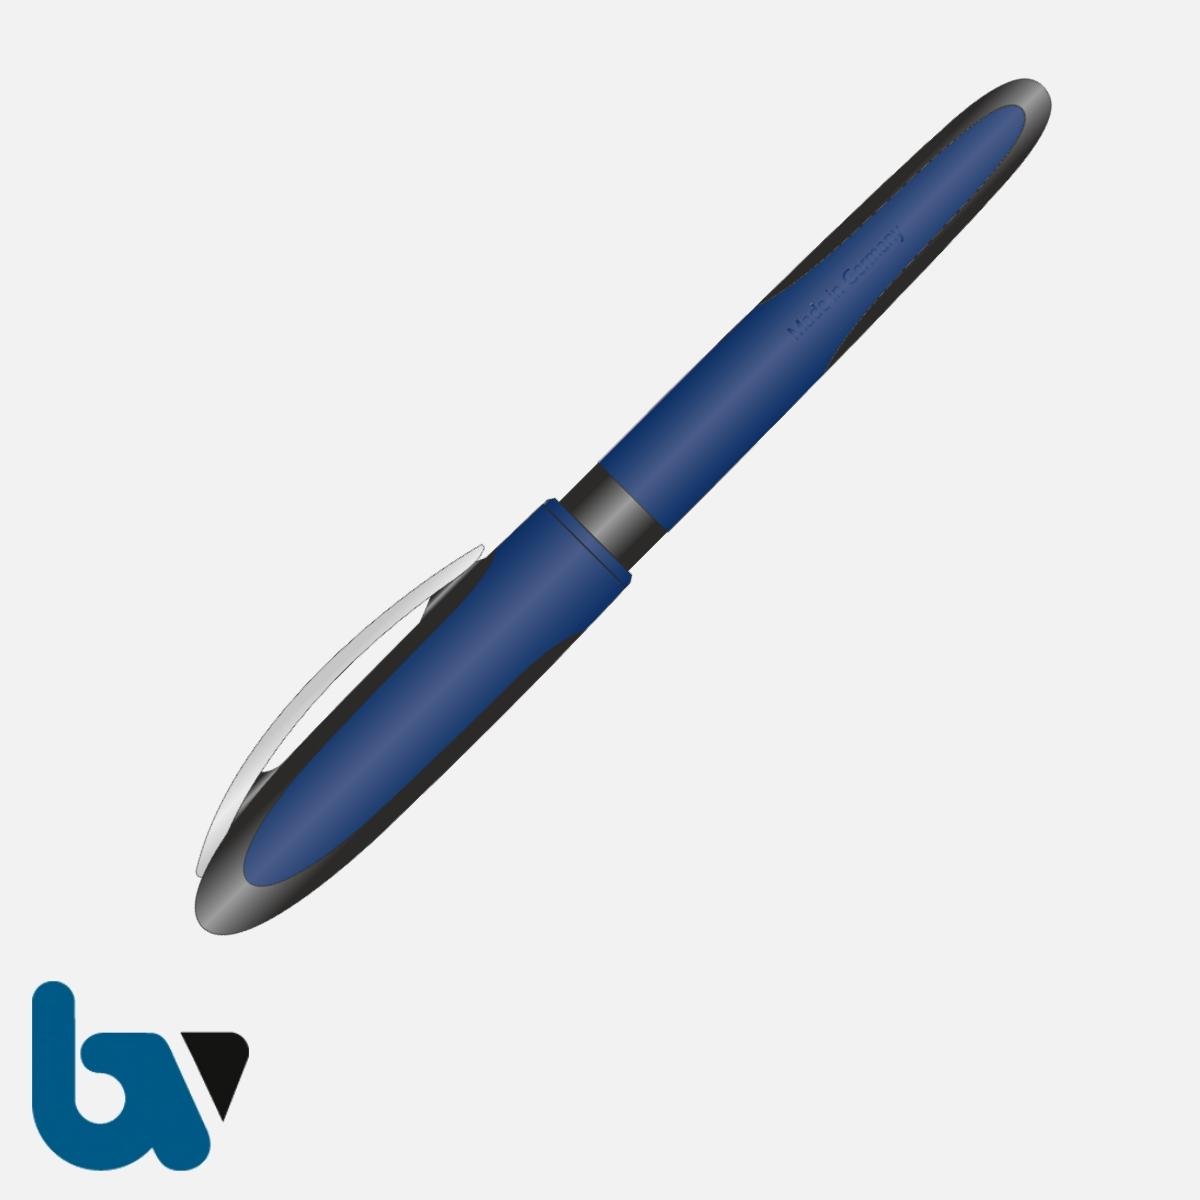 0/519-44 Tintenroller One Business schwarz dokumentenecht 2 | Borgard Verlag GmbH